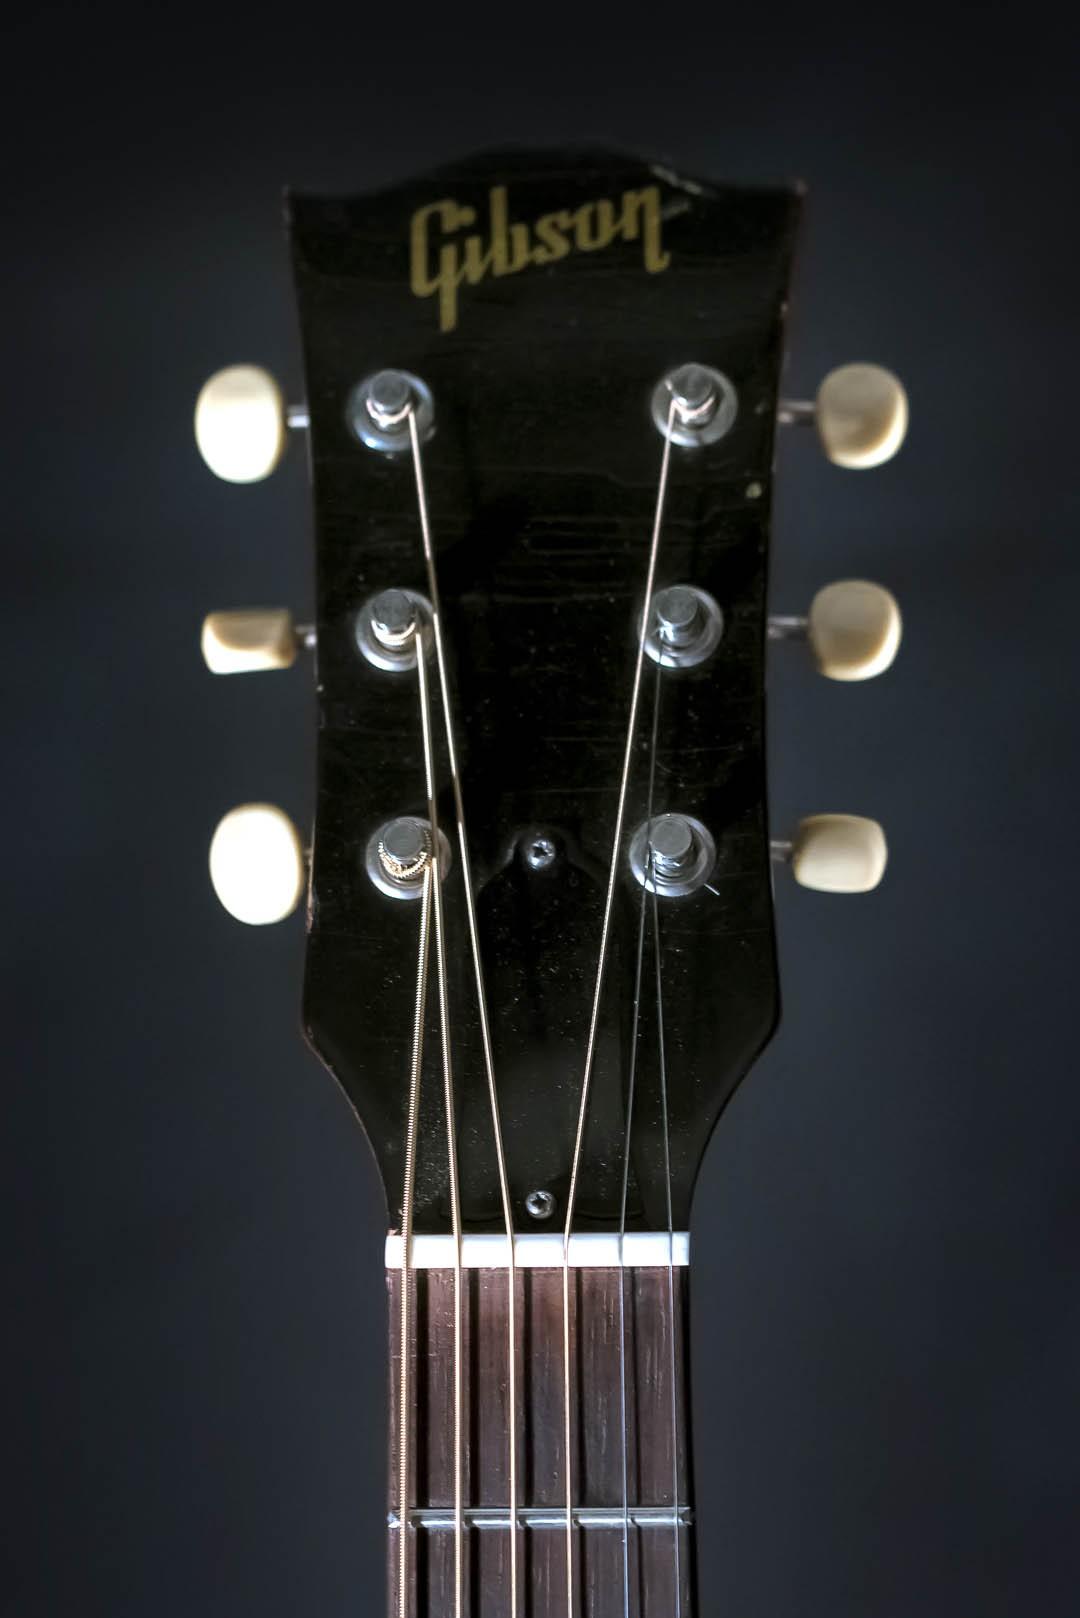 1963 GIBSON J 45 - Guitares vintage | RNFVG